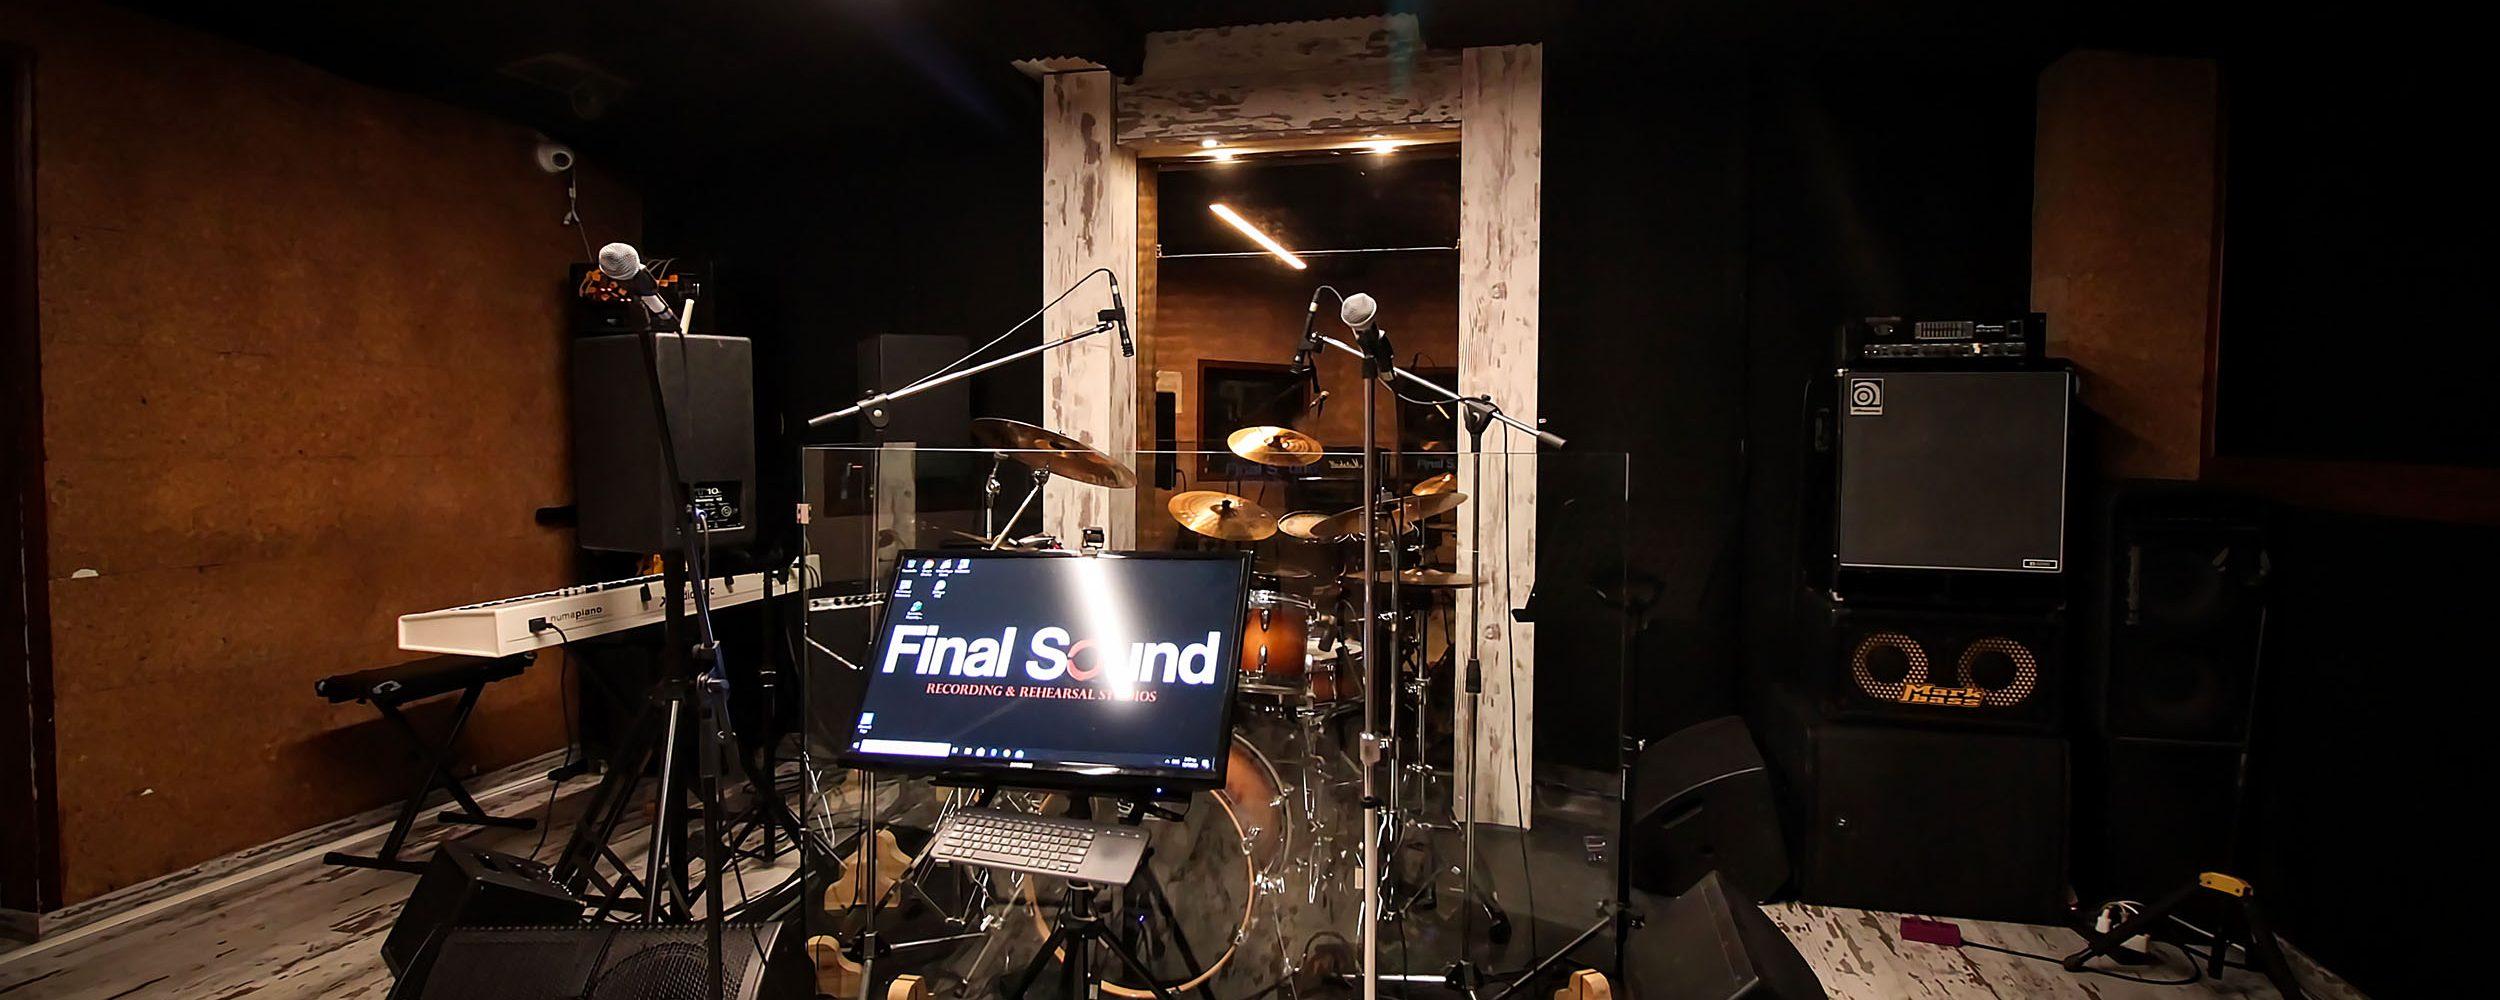 Final Sound Rehearsal 21